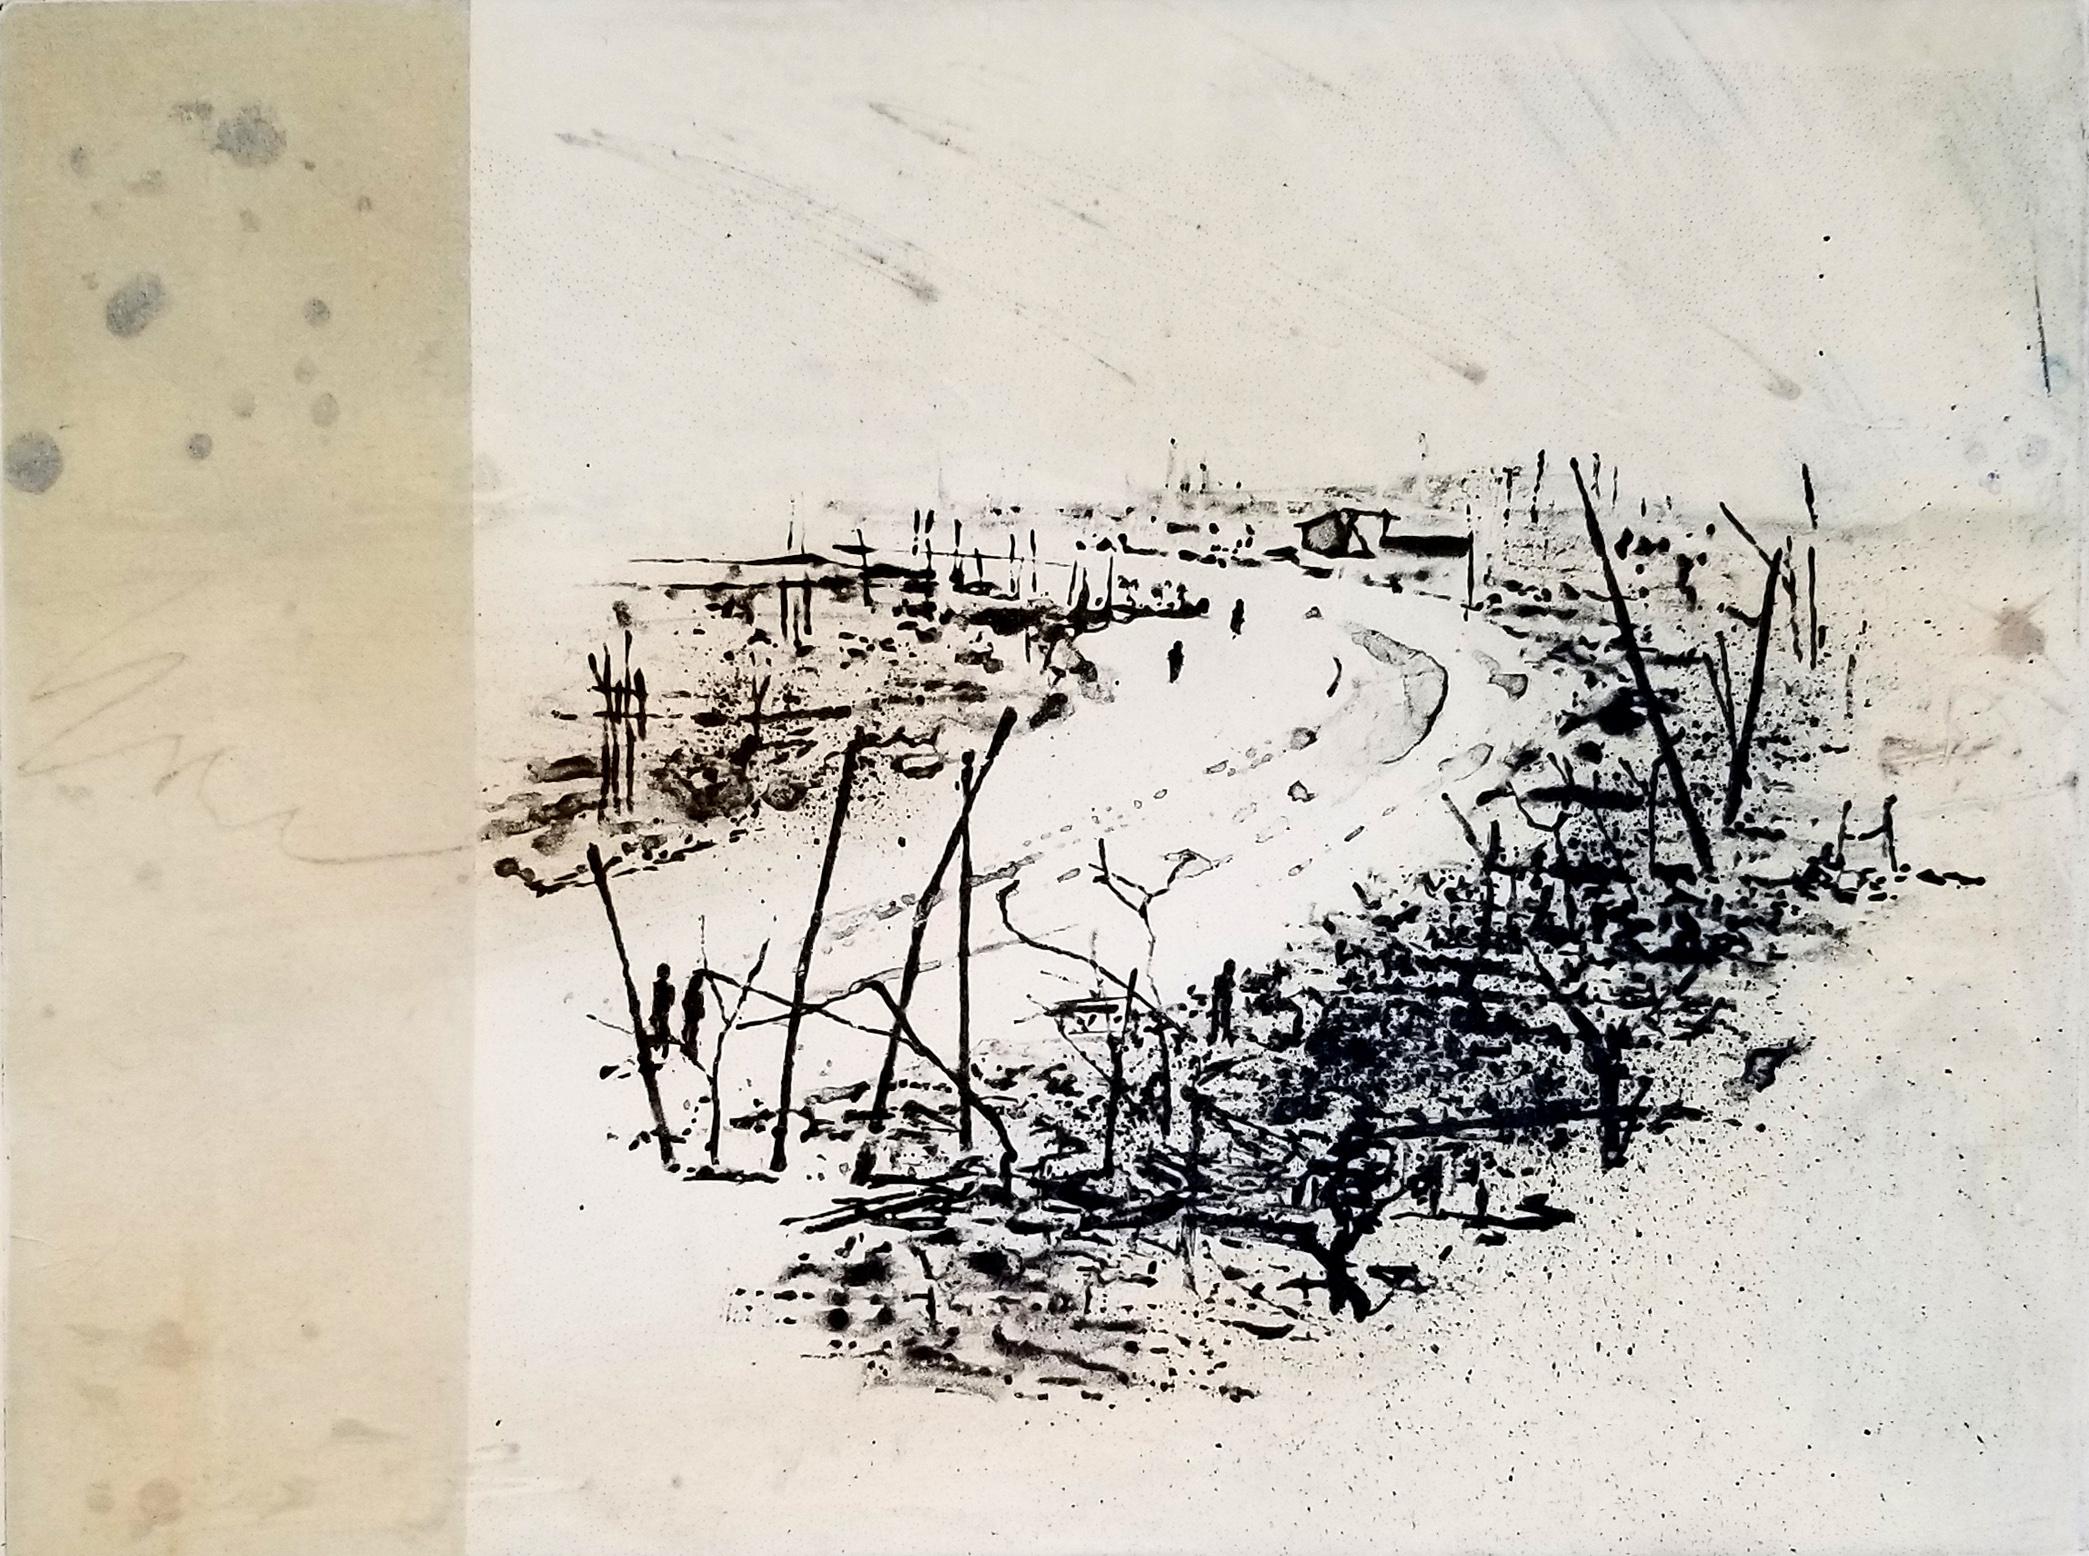 Linda Yoshizawa, Mecha Kucha, Solarplate etching and collage, 6 x 8 in, 2018